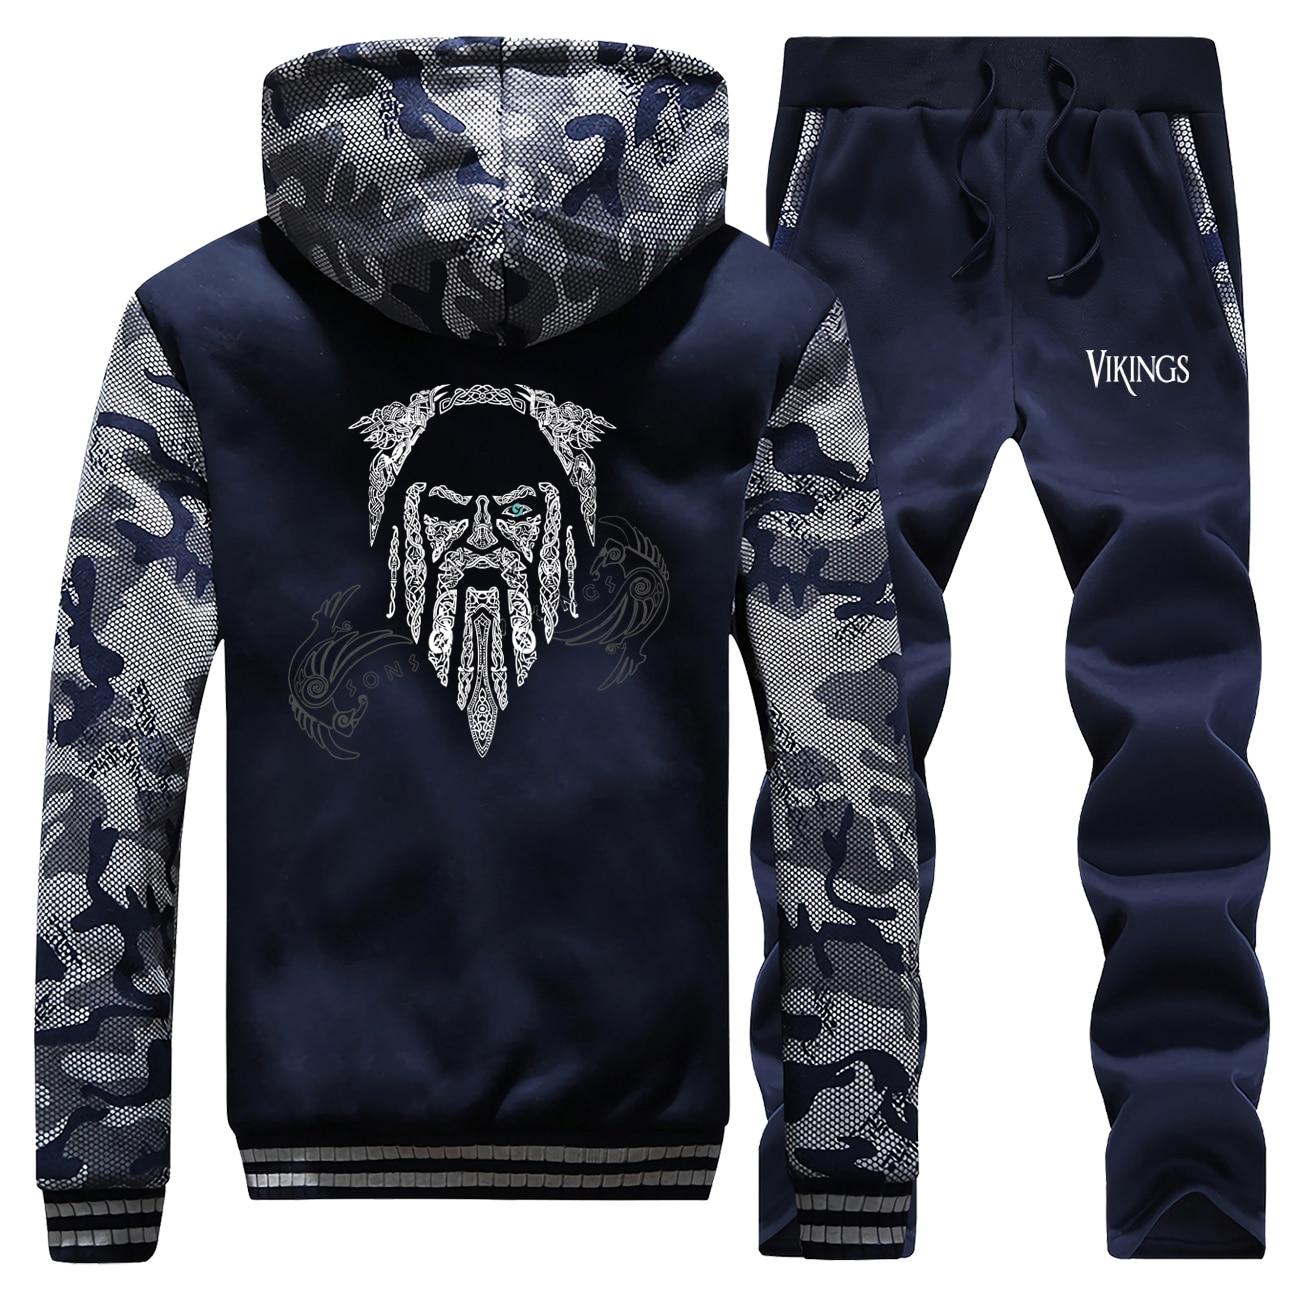 New 2019 Winter Vikings Coat Thick Sweatshirts Fleece Hooded Warm Jackets Funny Men Camouflage Streetwear Suit+2 Piece Set Pants